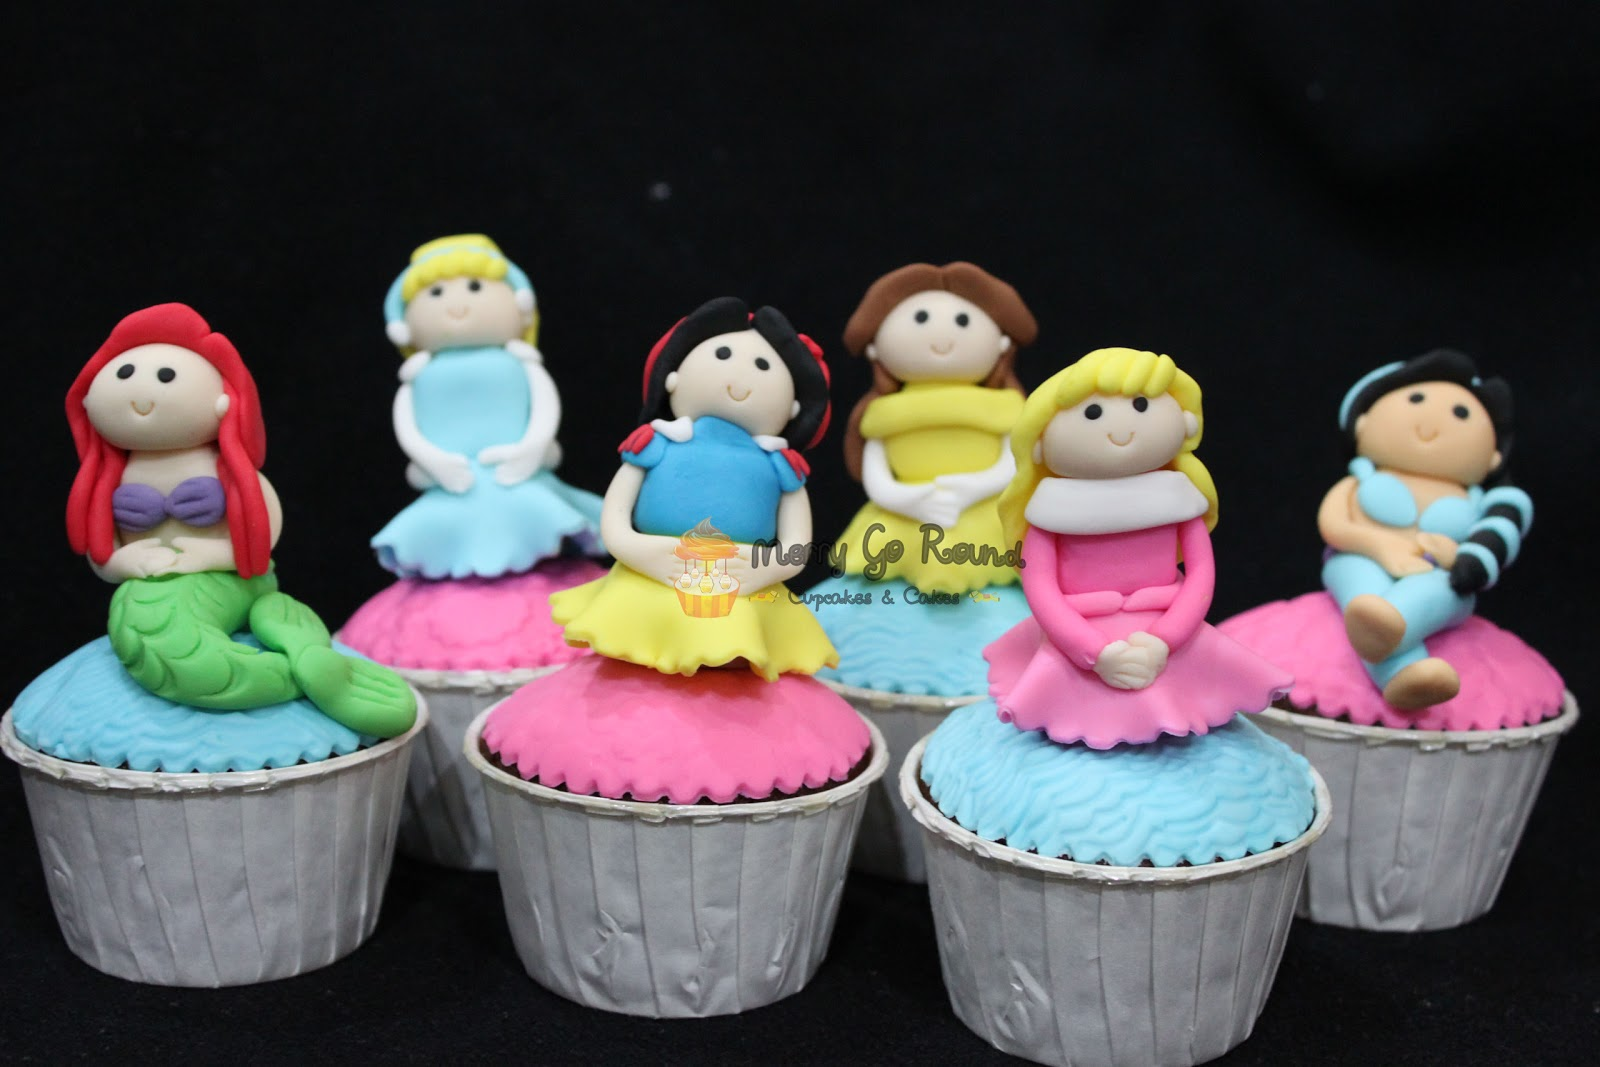 Princess Cake Ideas With Cupcakes : Merry Go Round - Cupcakes & Cakes: Disney Princess ...